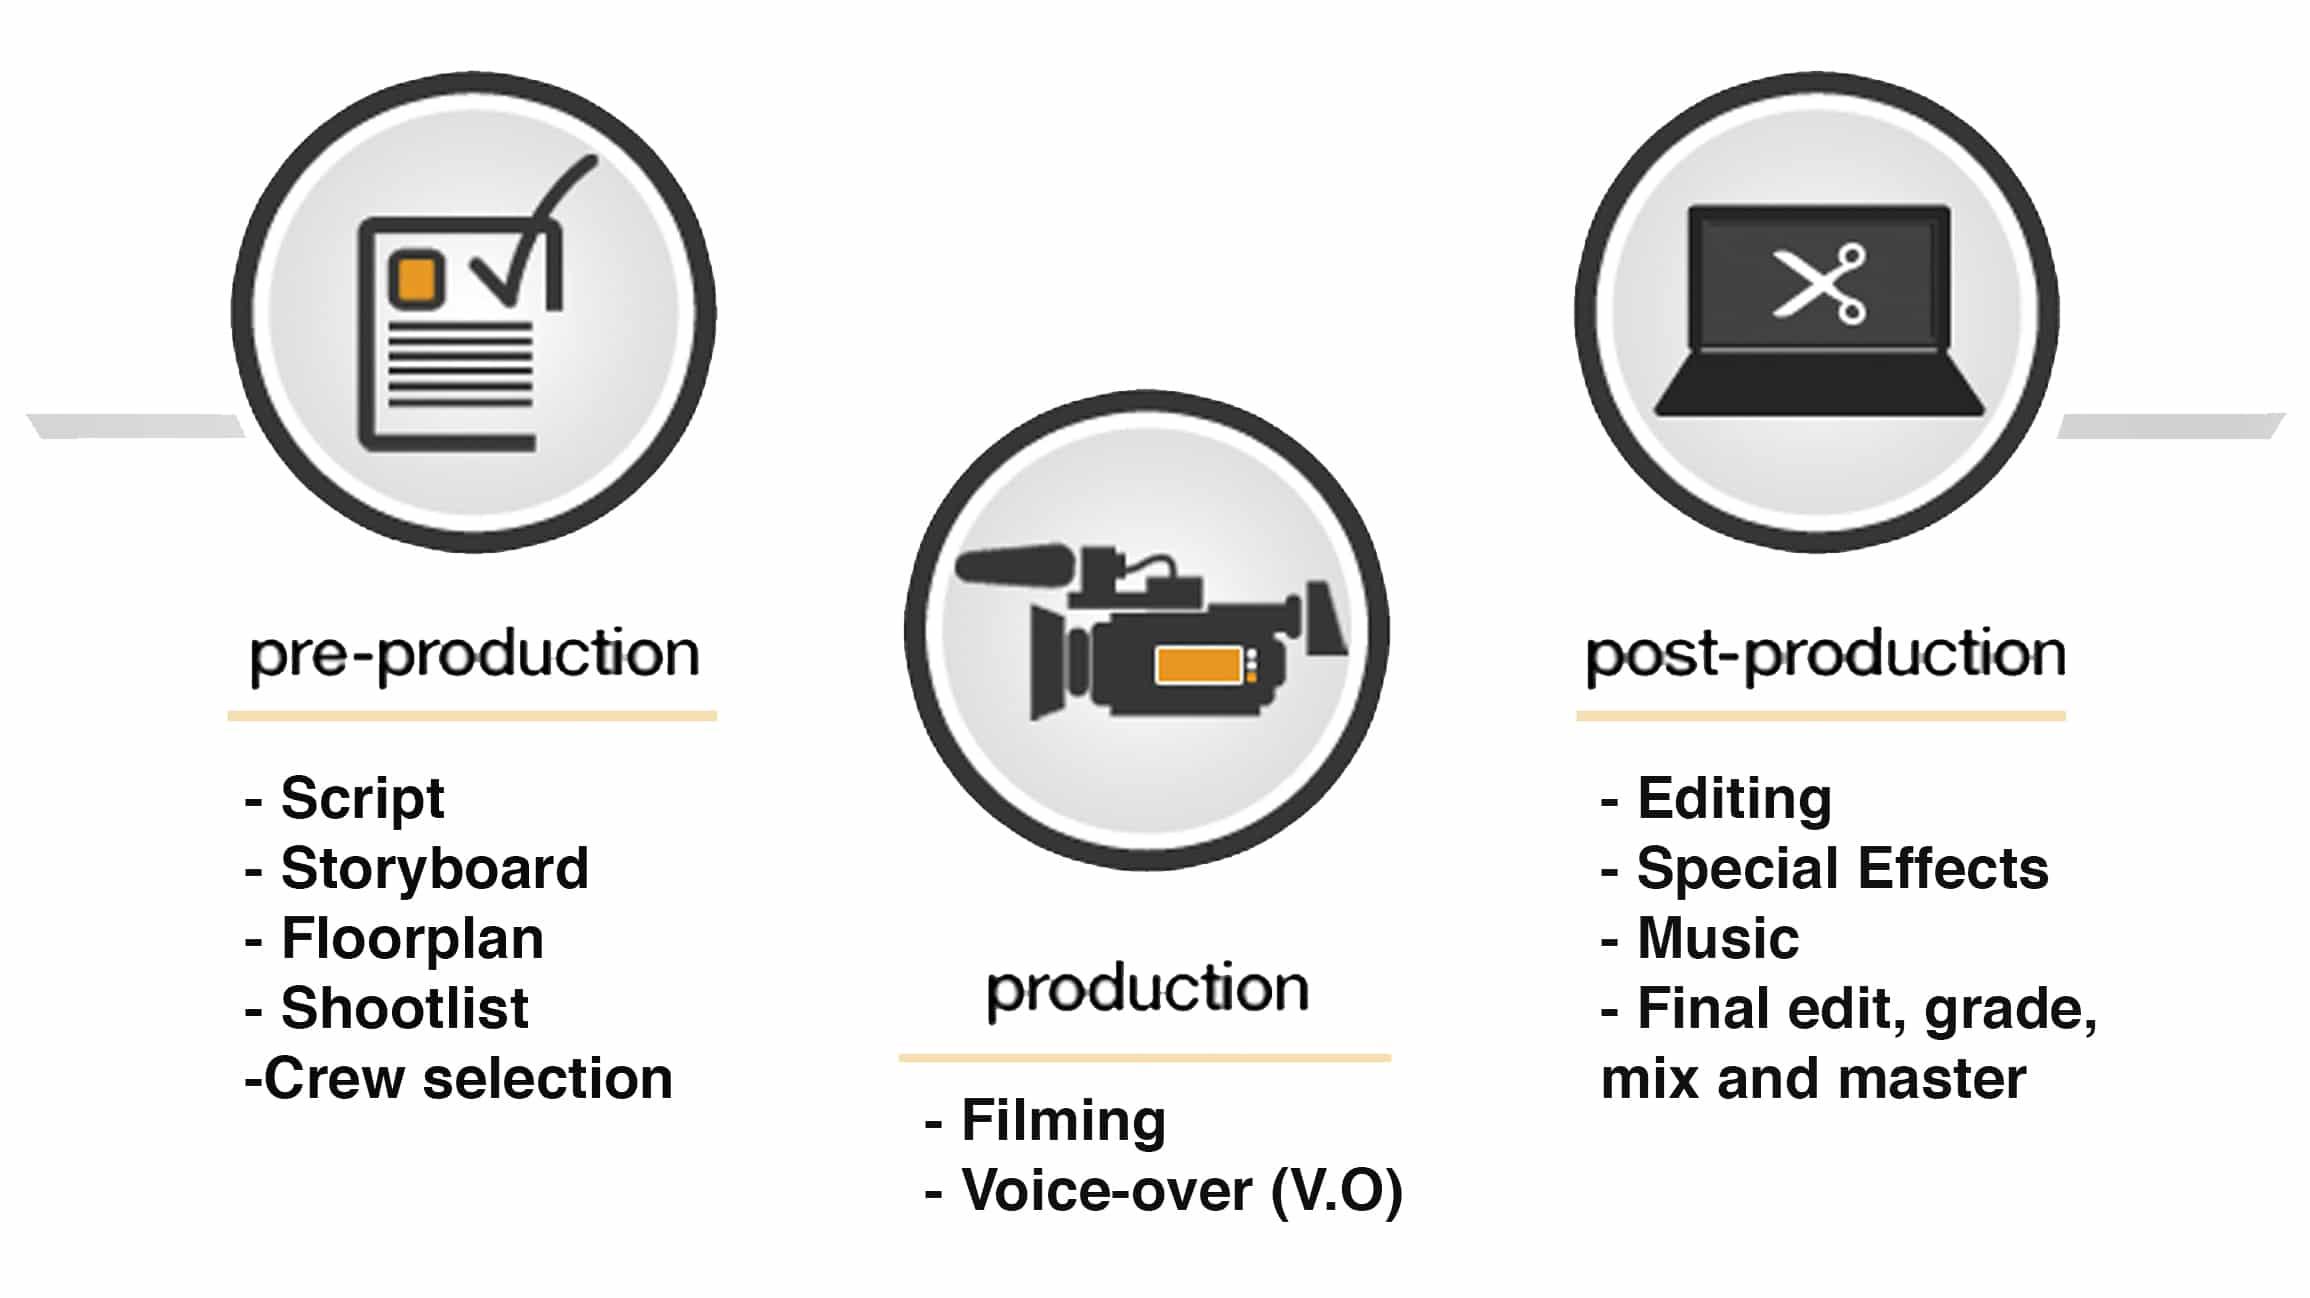 Video production process, Video production process image, movie production process, film production process, pre production postproduction pre production,